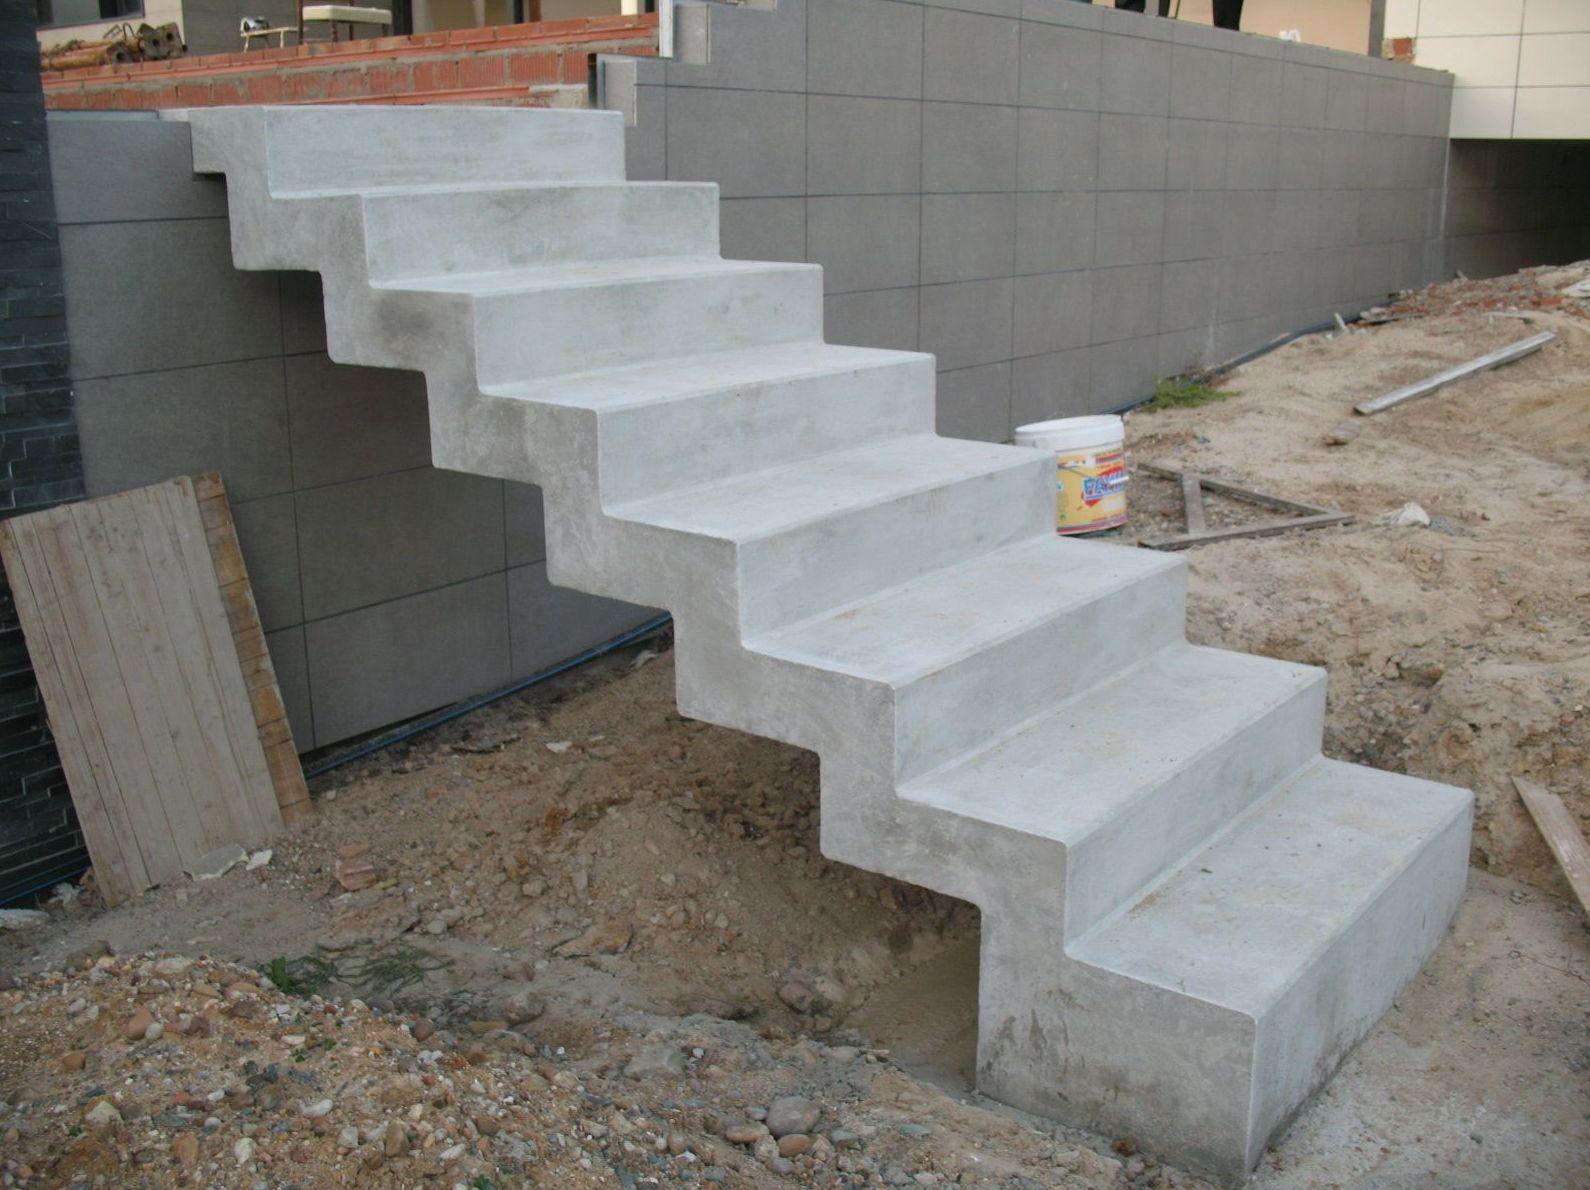 Escaleras prefabricadas